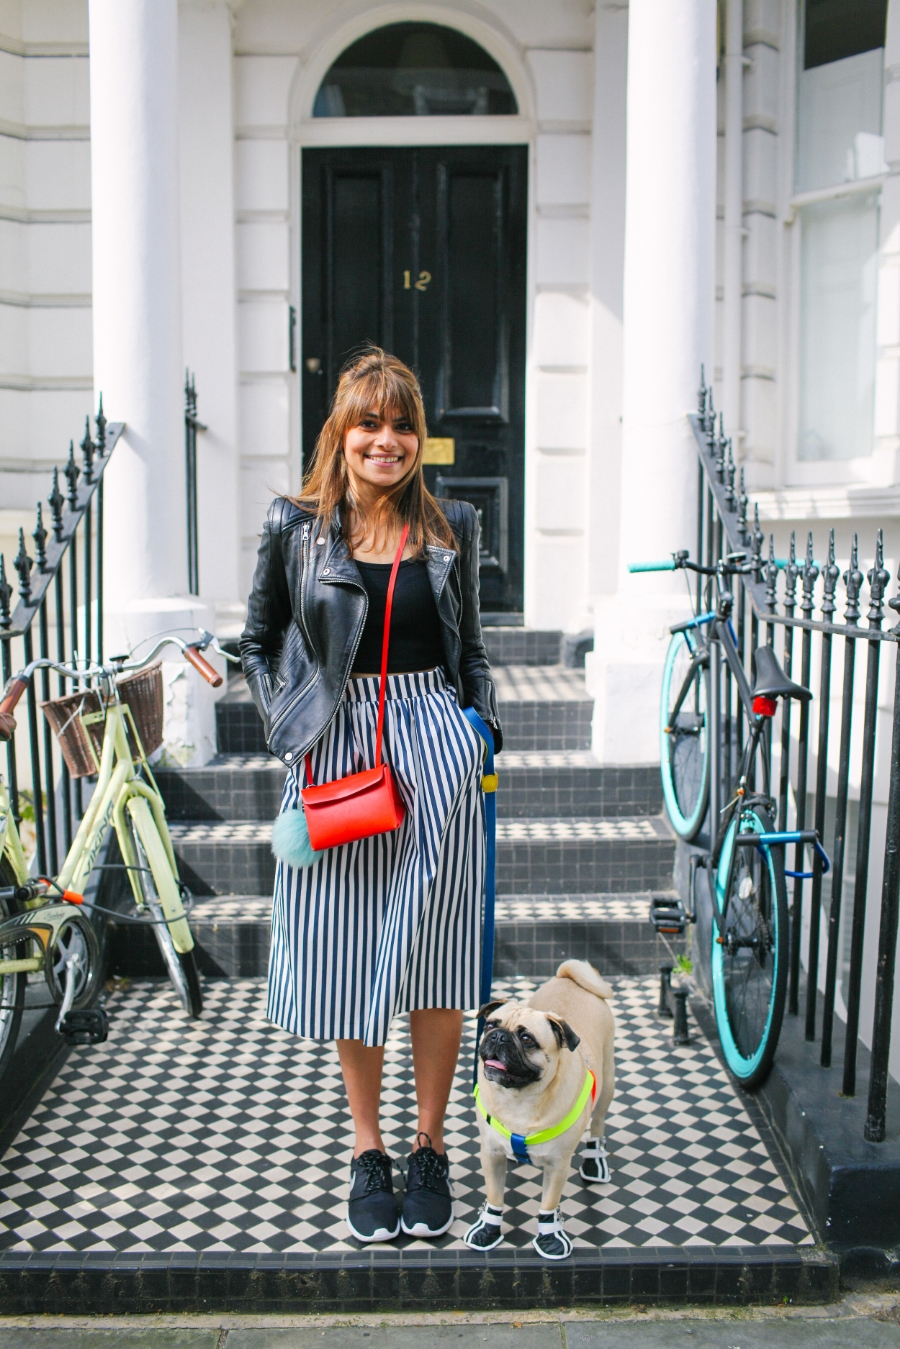 honeyifdressedthepug-uk-london-nottinghill-red-pug-puglife-pugswag-dog-pet-doggyshoes-stripes-midi-skirt-zara-pompom-squishyface-arithepug-puppy-coolpups-trendy-chic-sneakers-nike-door-colours-fashion-streetstyle-bike-harness-leadthewalk-bikerkacket